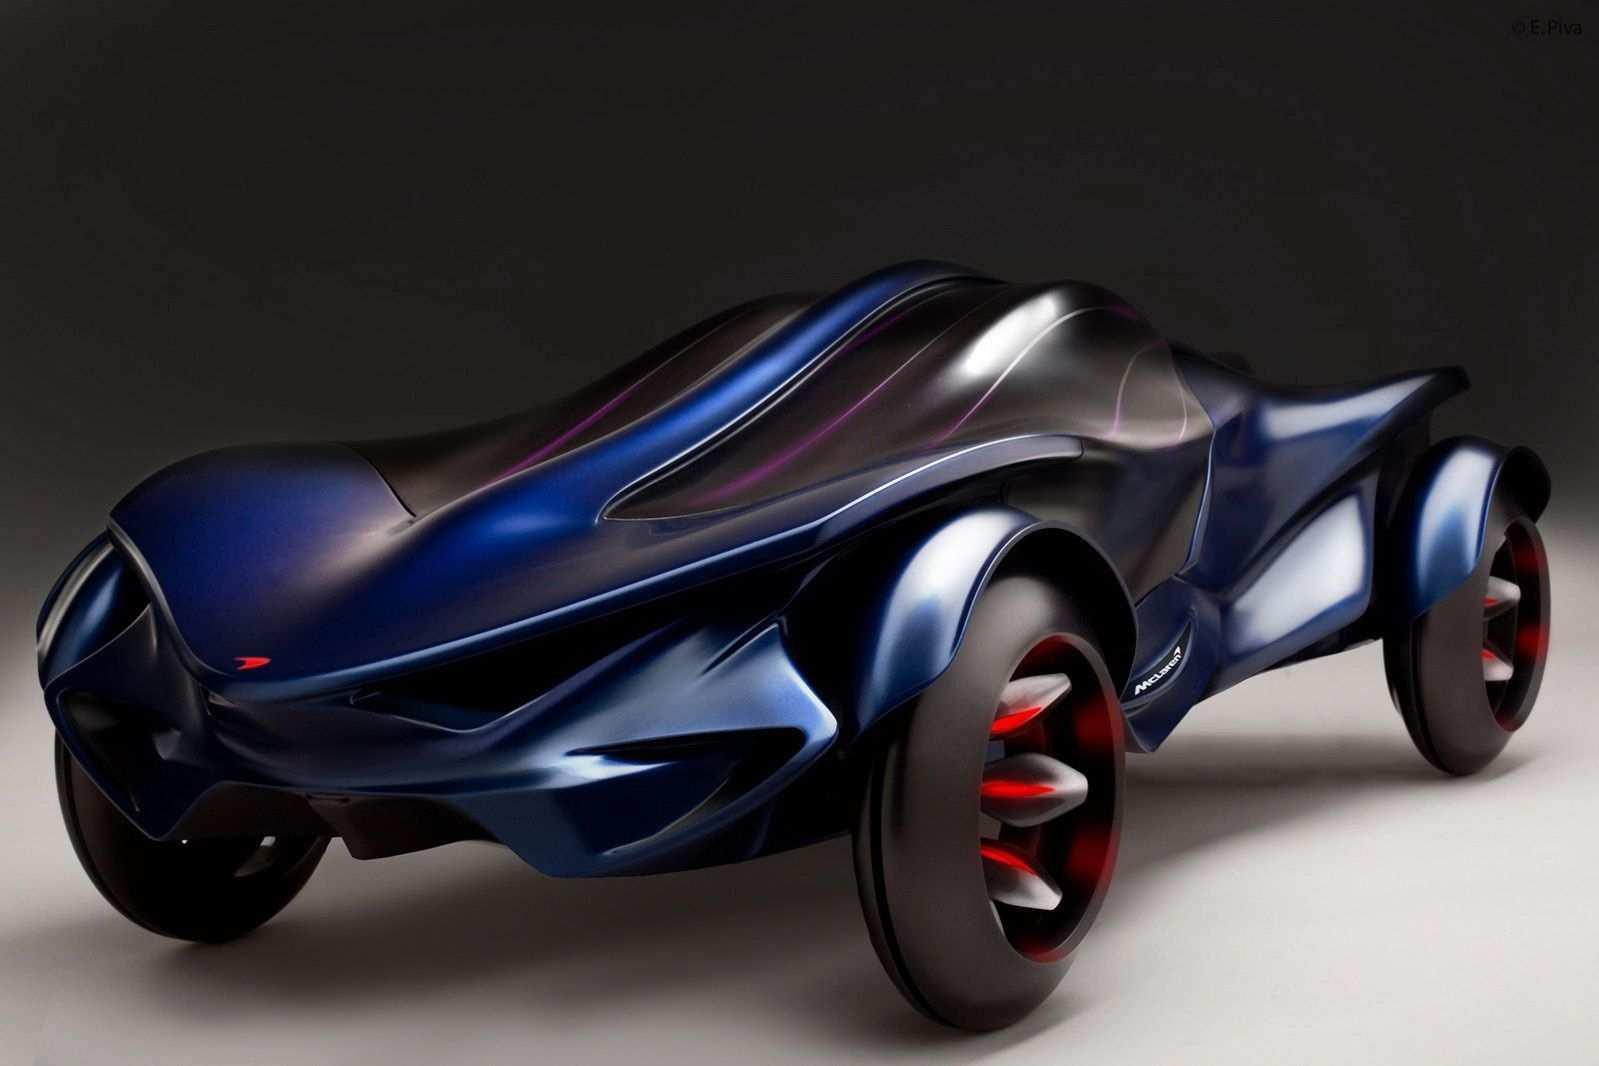 58 All New 2020 Bugatti Veyron Performance and New Engine by 2020 Bugatti Veyron